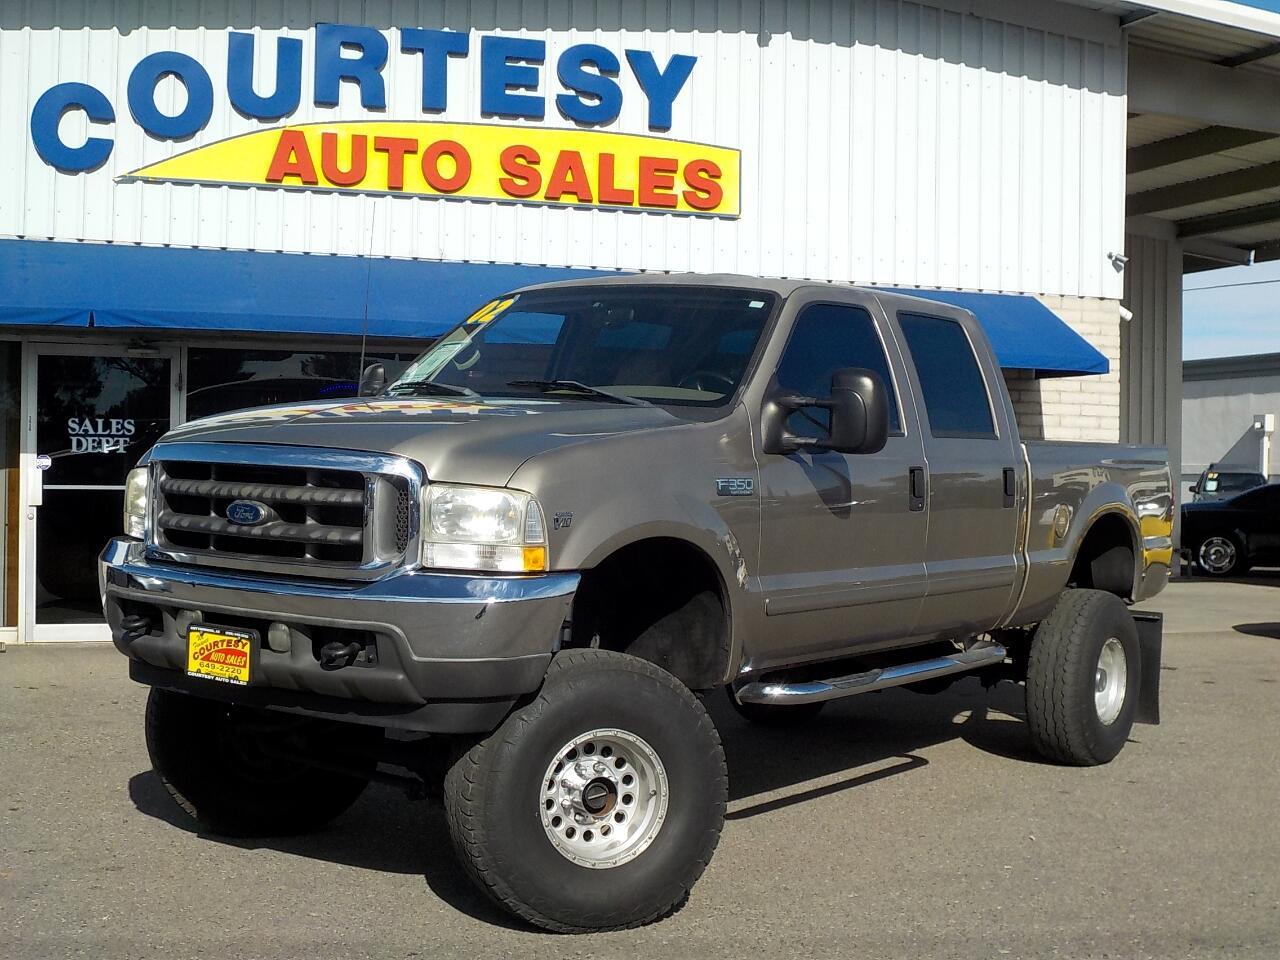 Used Cars For Sale Prescott Valley Az 86314 Courtesy Auto Sales Pv